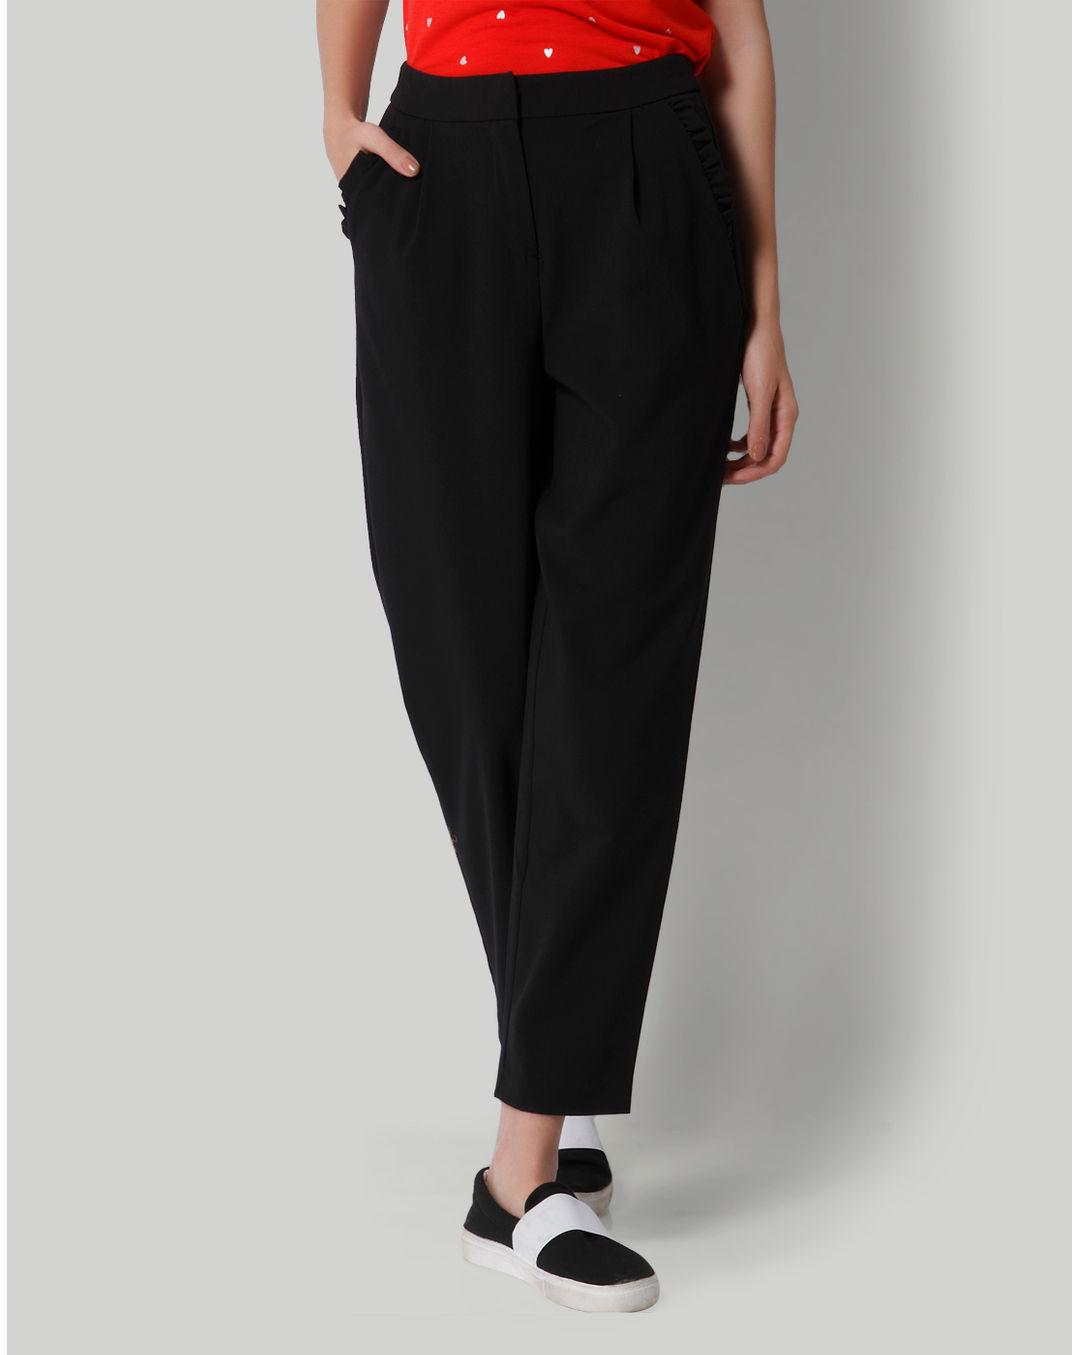 Only Women Casual Wear Solid Trouser